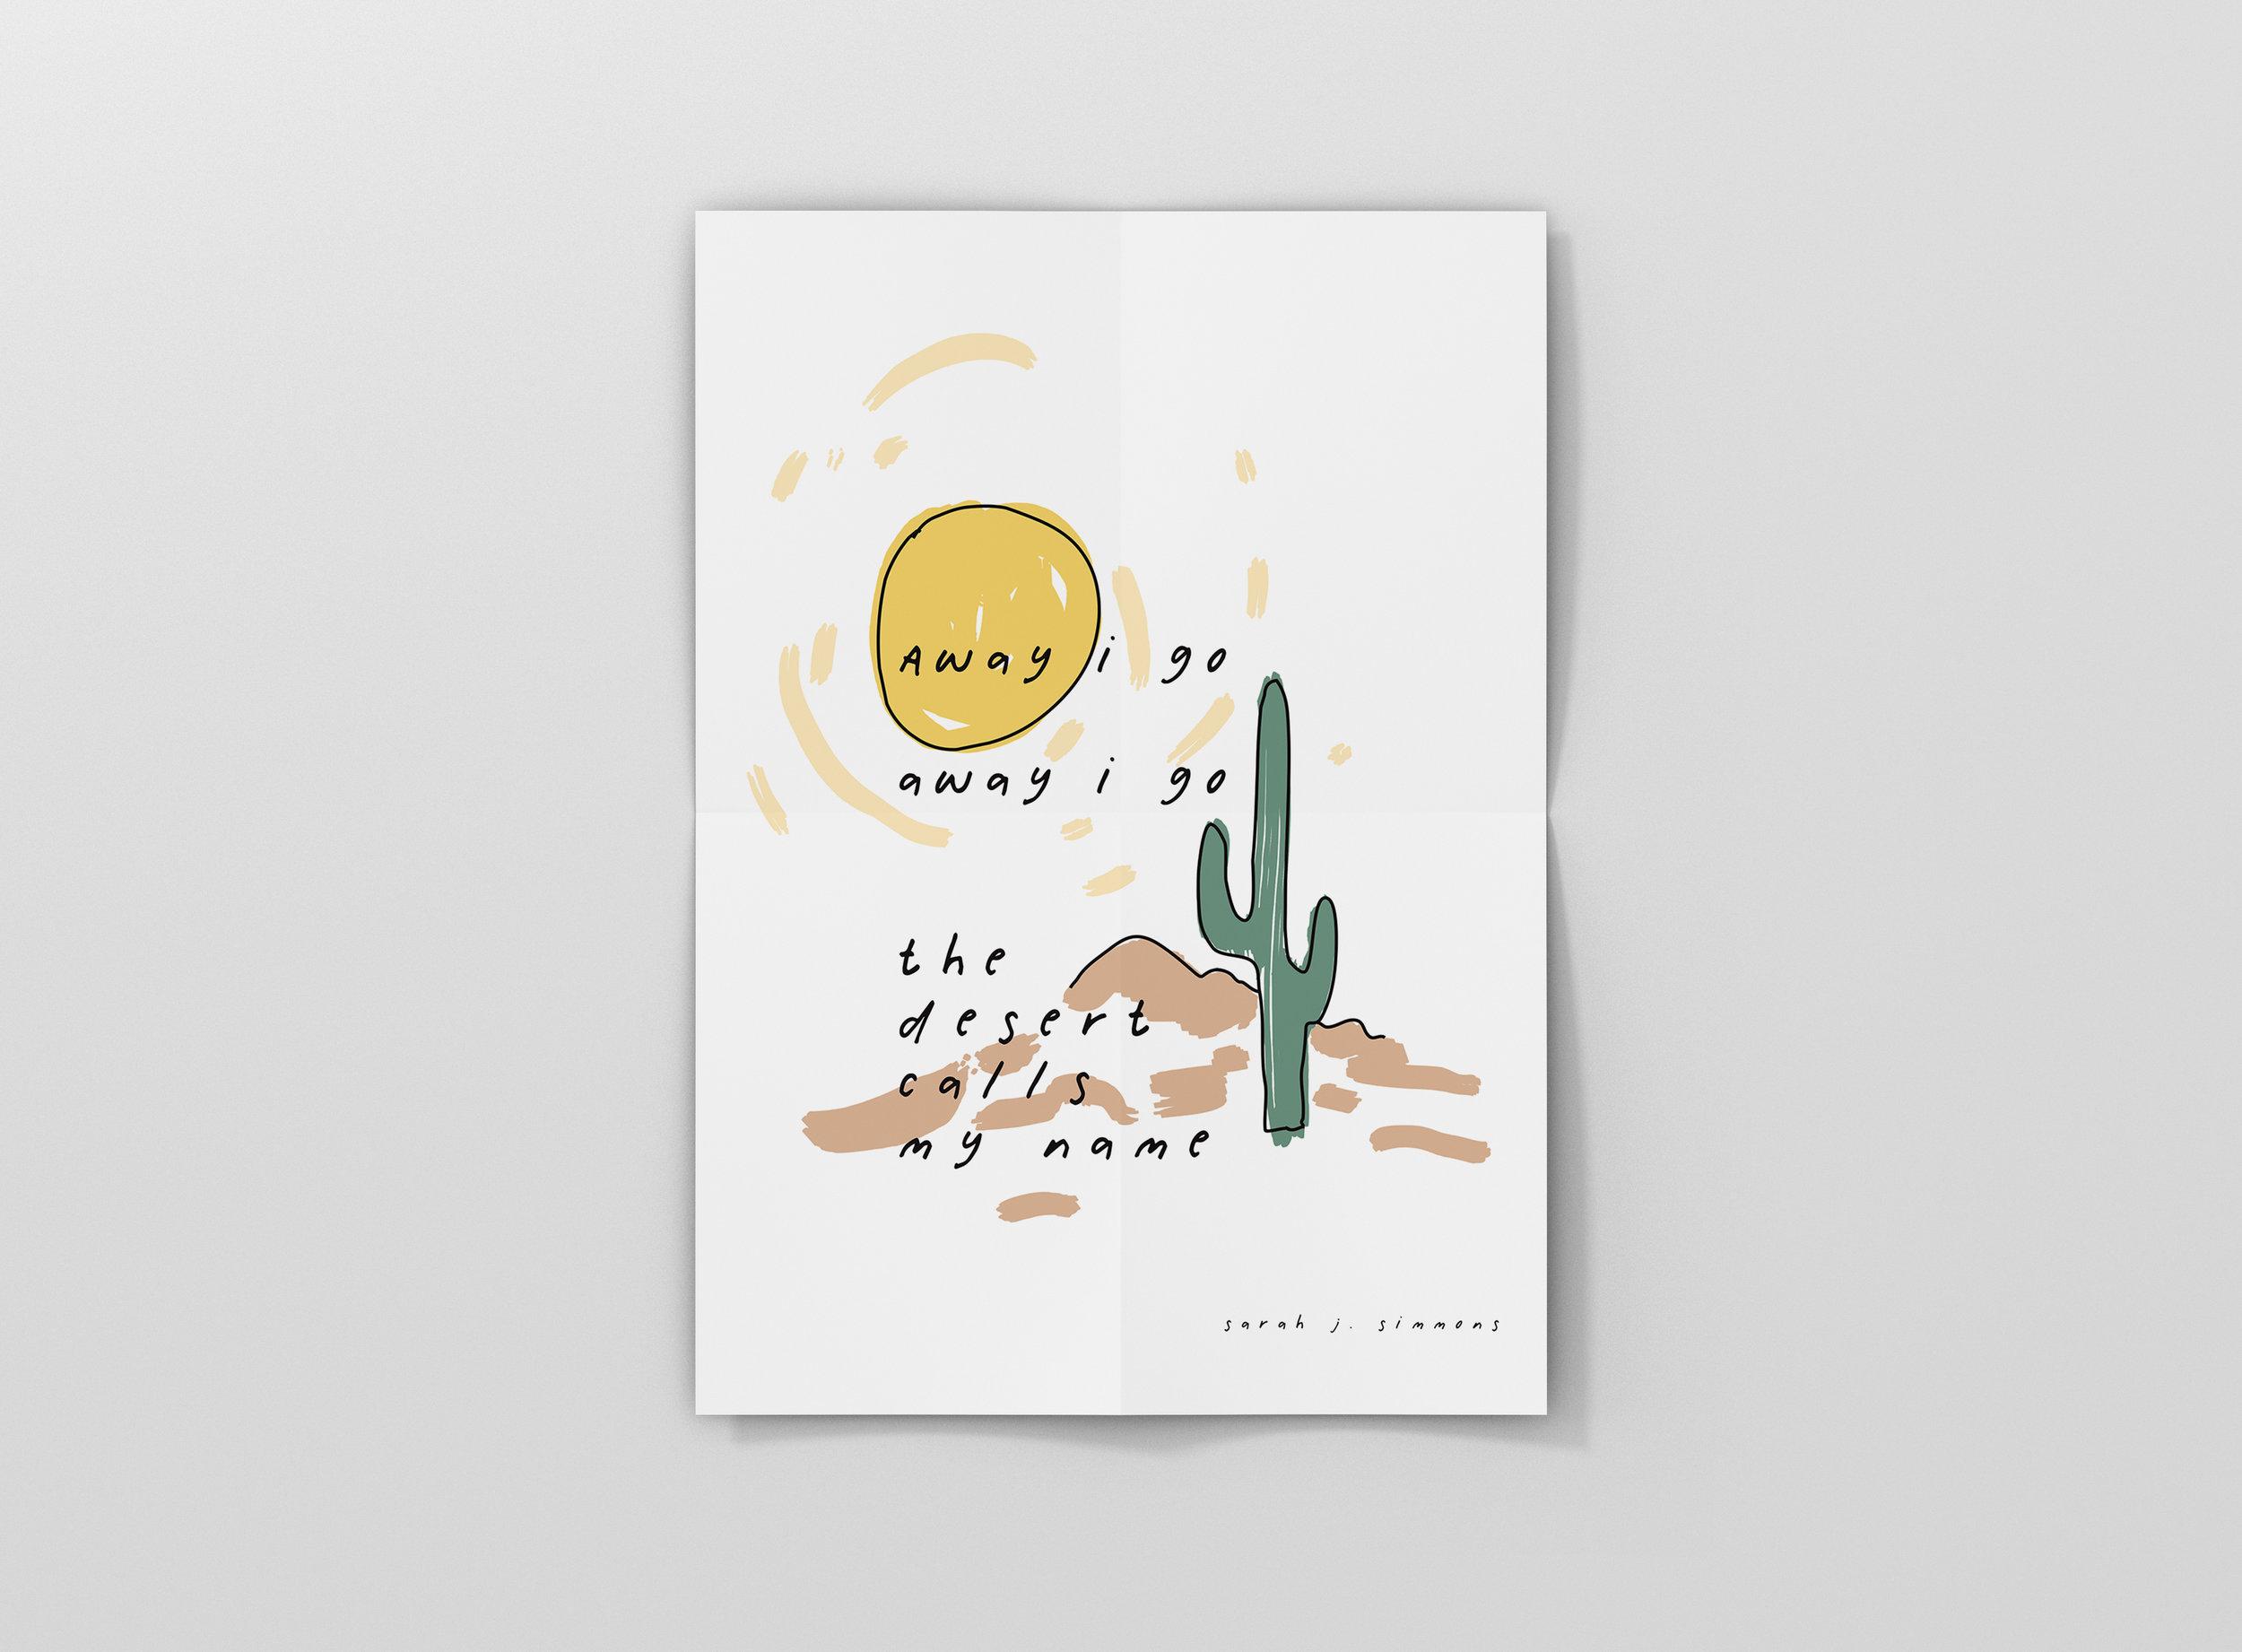 Little saint southwest / illustration + design